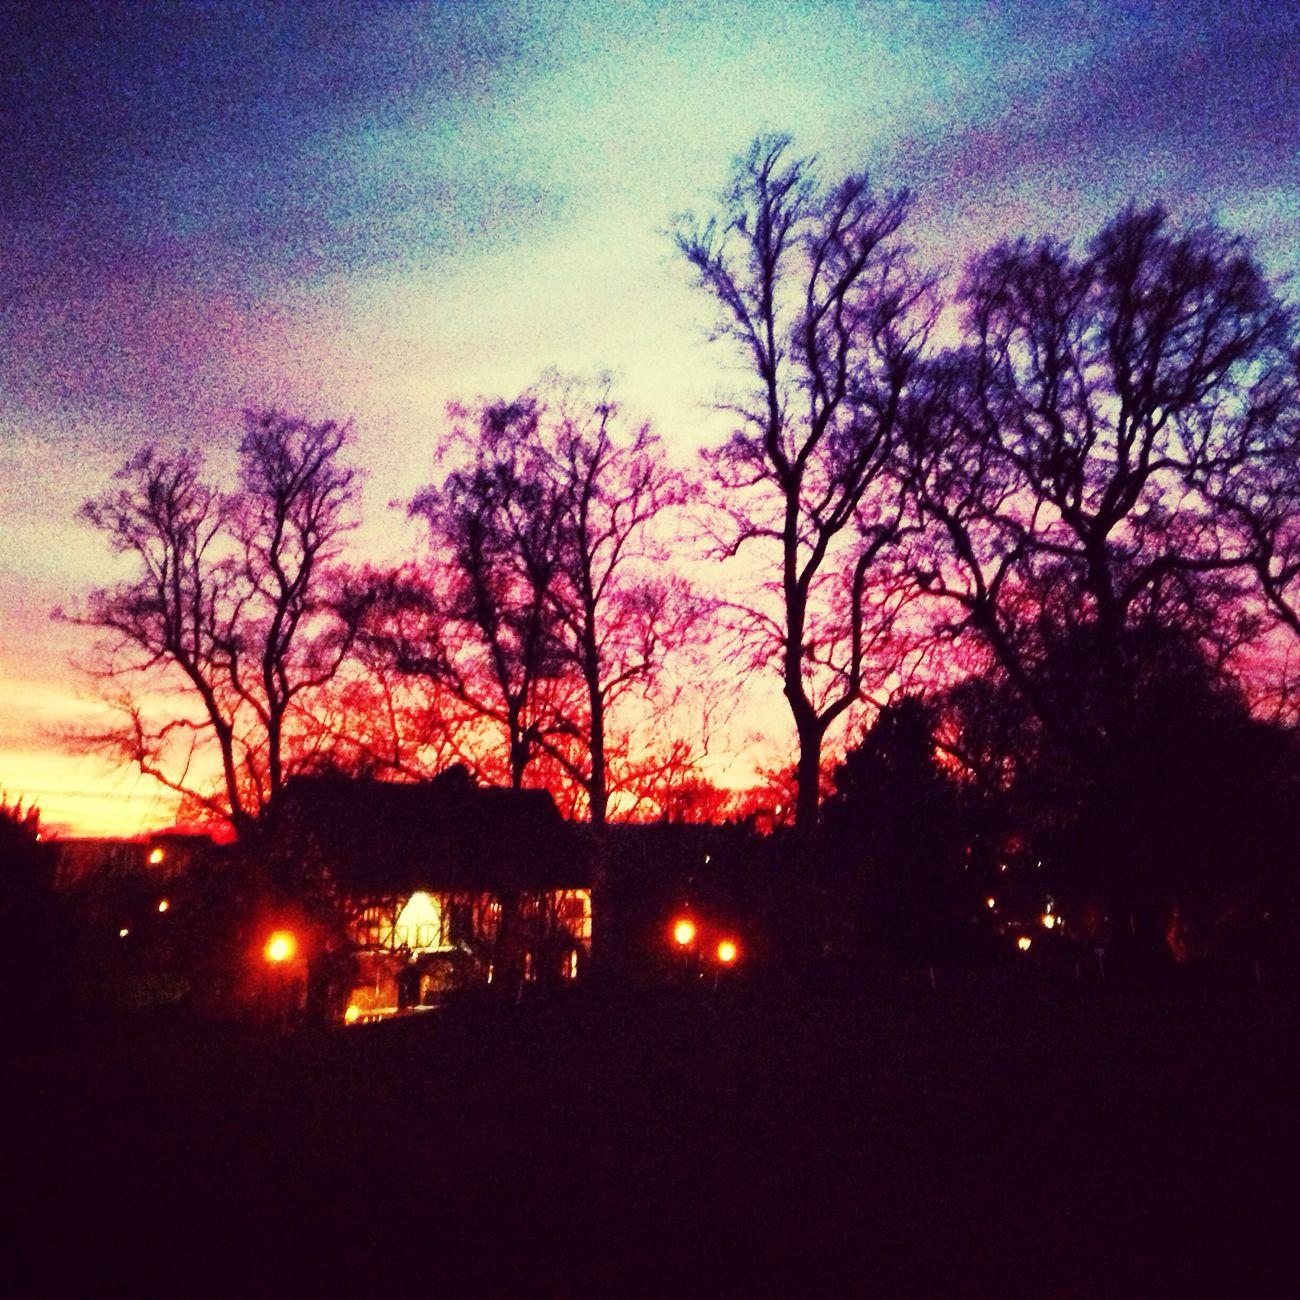 Candy Skies ? Treenporn Candysky England Sunset